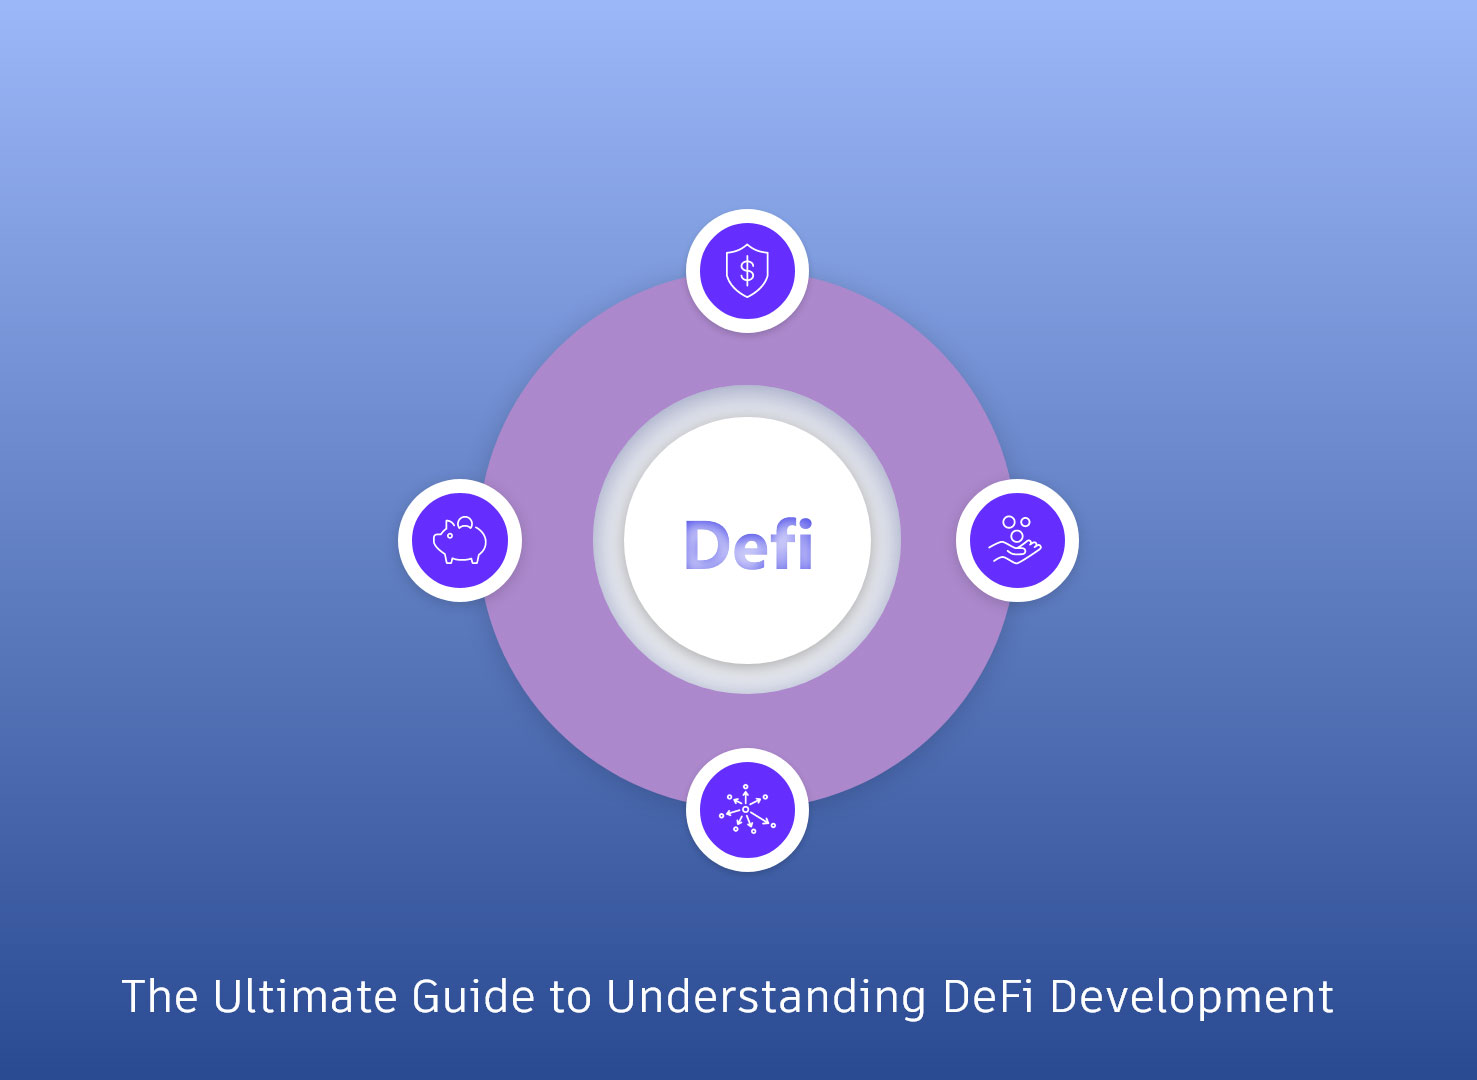 Defi development